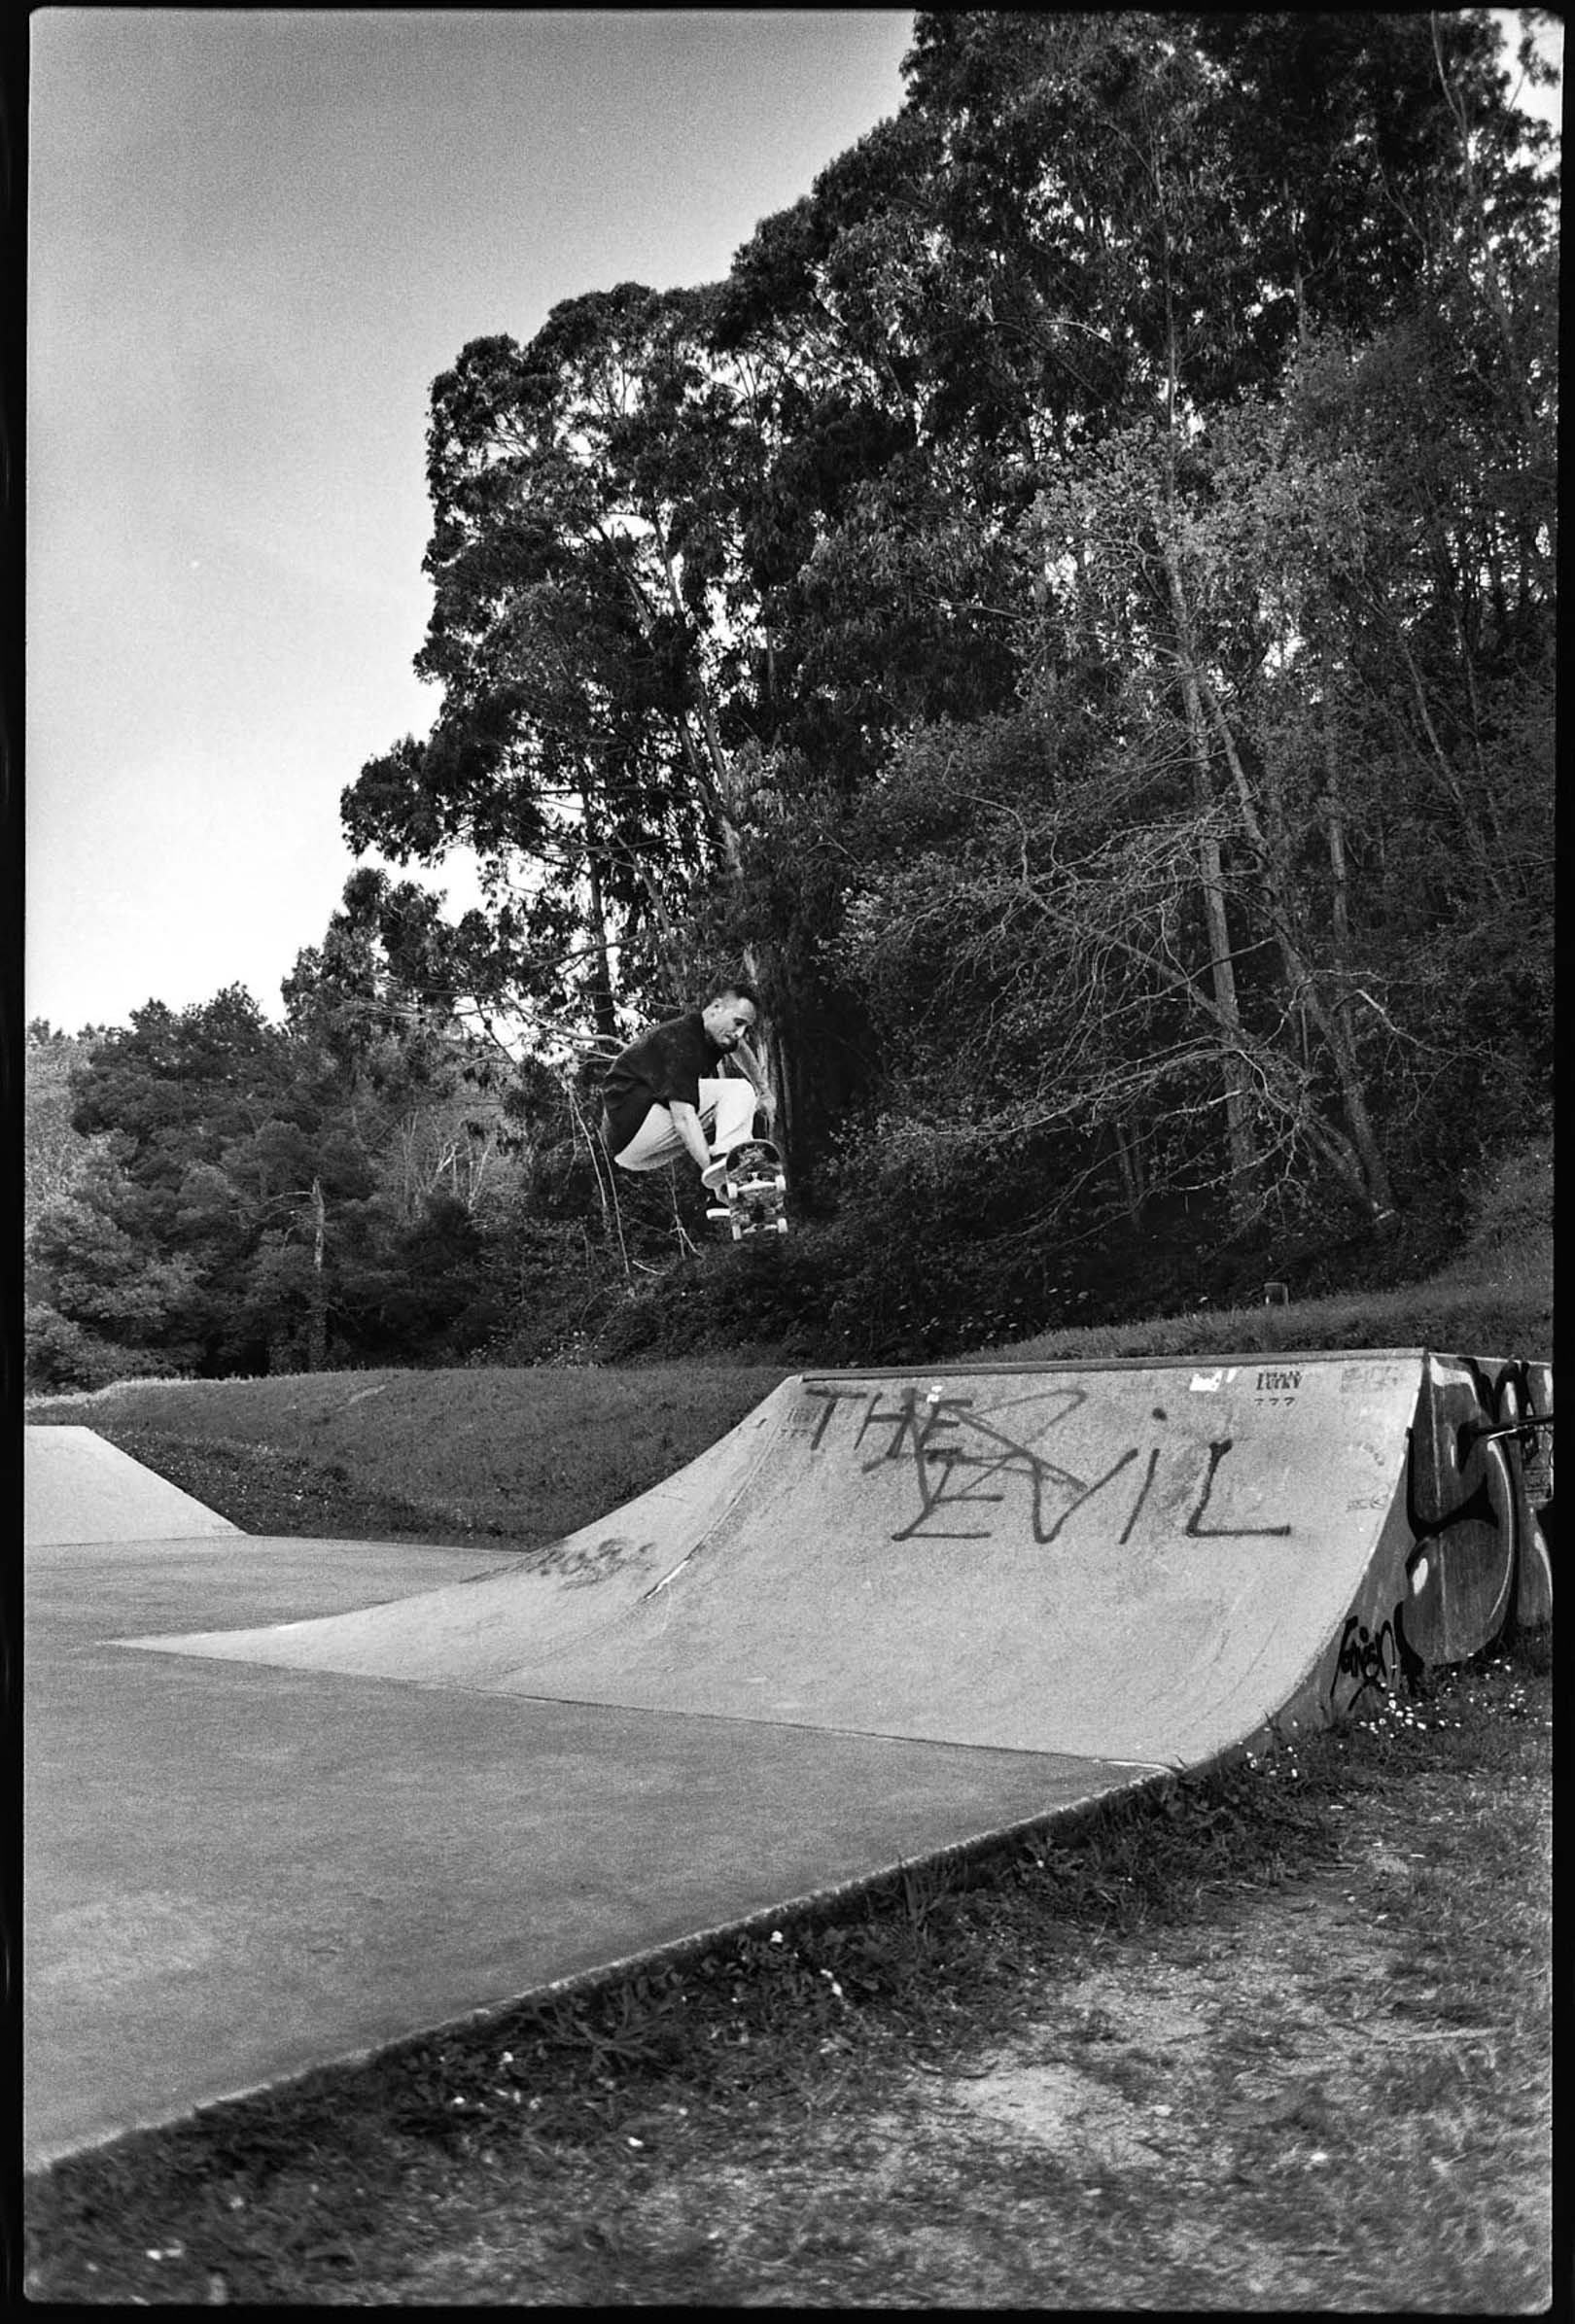 fotografia-coruña-skate-5.jpg